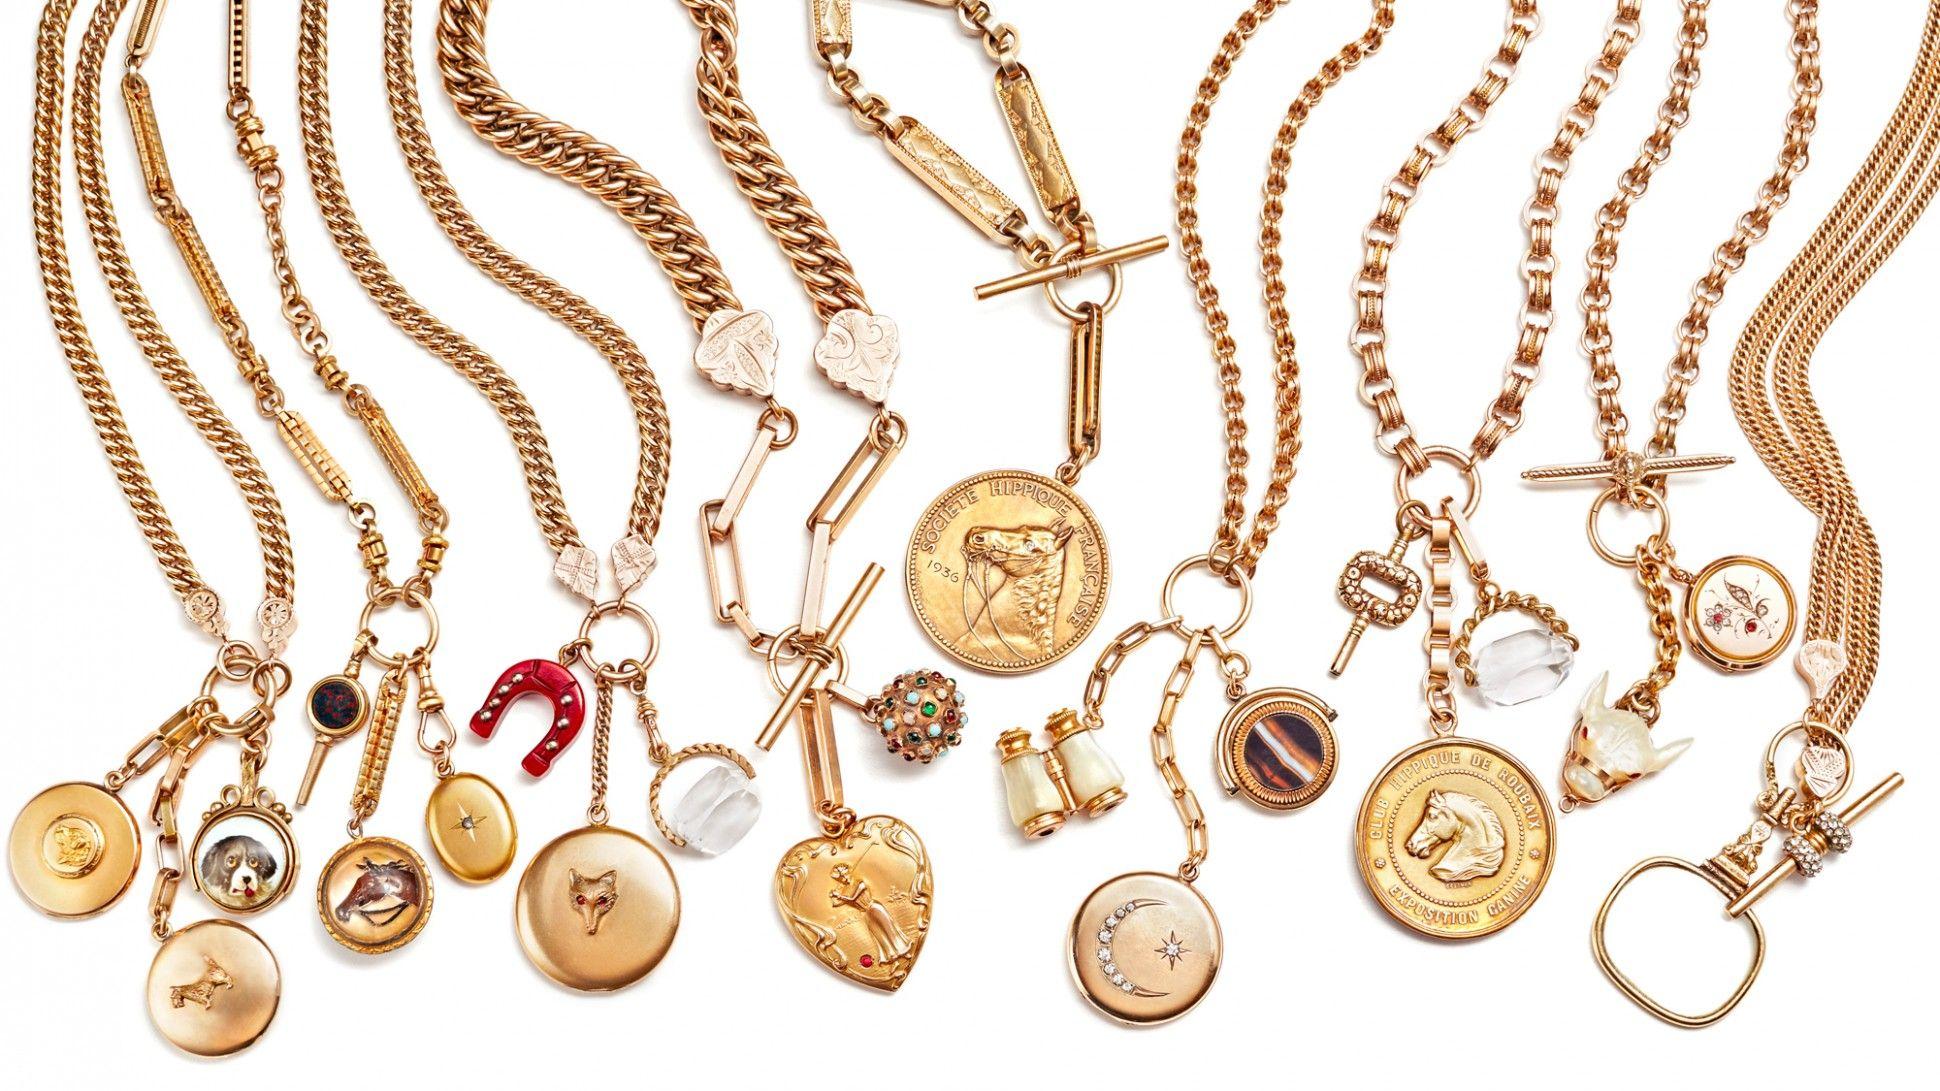 vintage jewelry - Cerca con Google